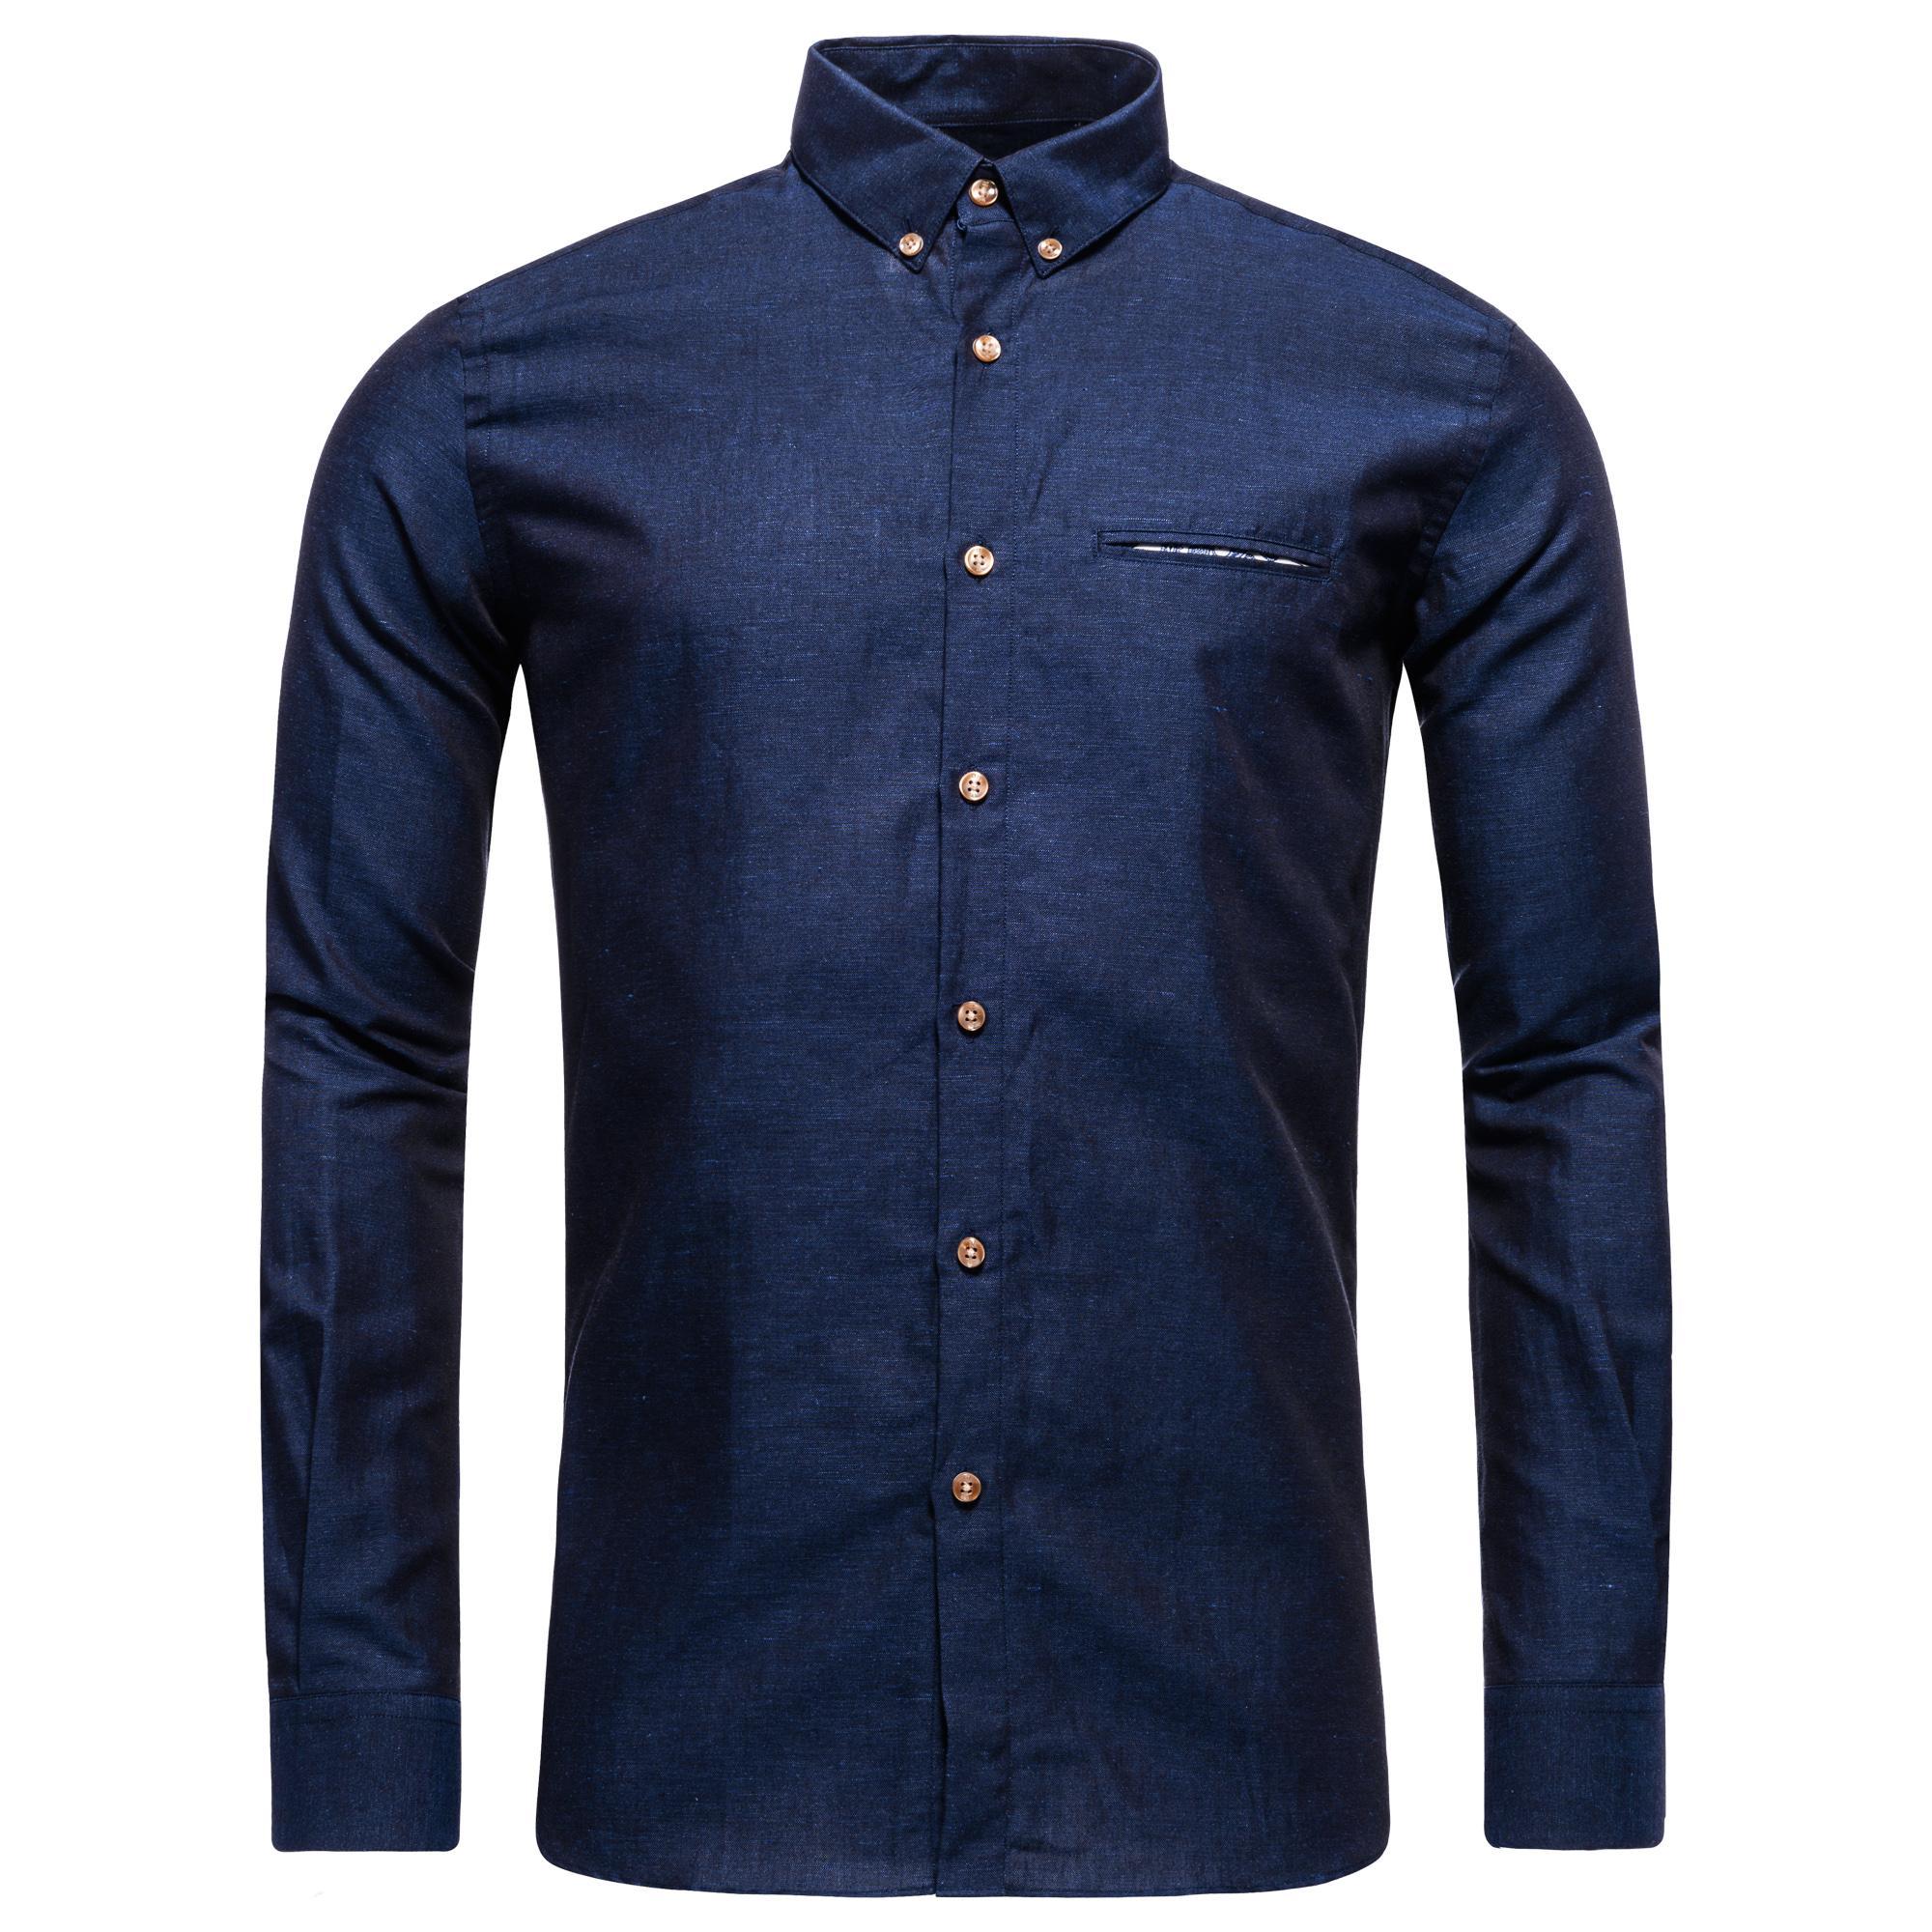 CR7 Skjorta Slim Fit Navy